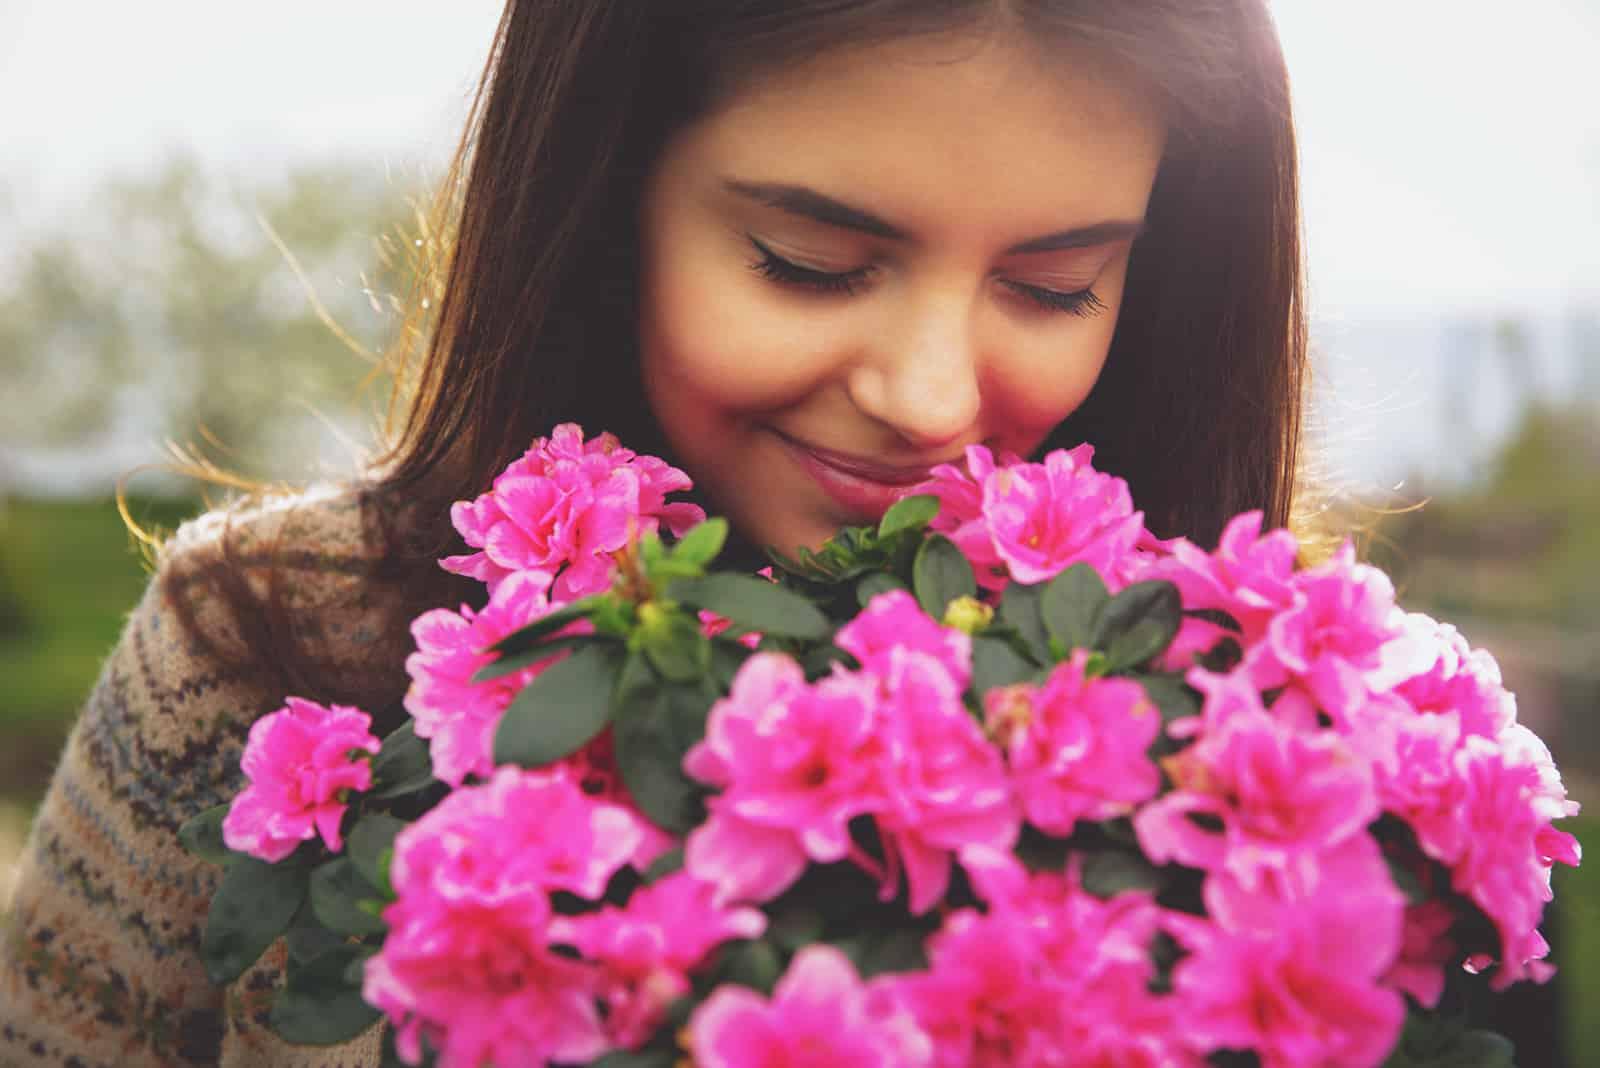 Junge süße Frau, die rosa Blumen riecht